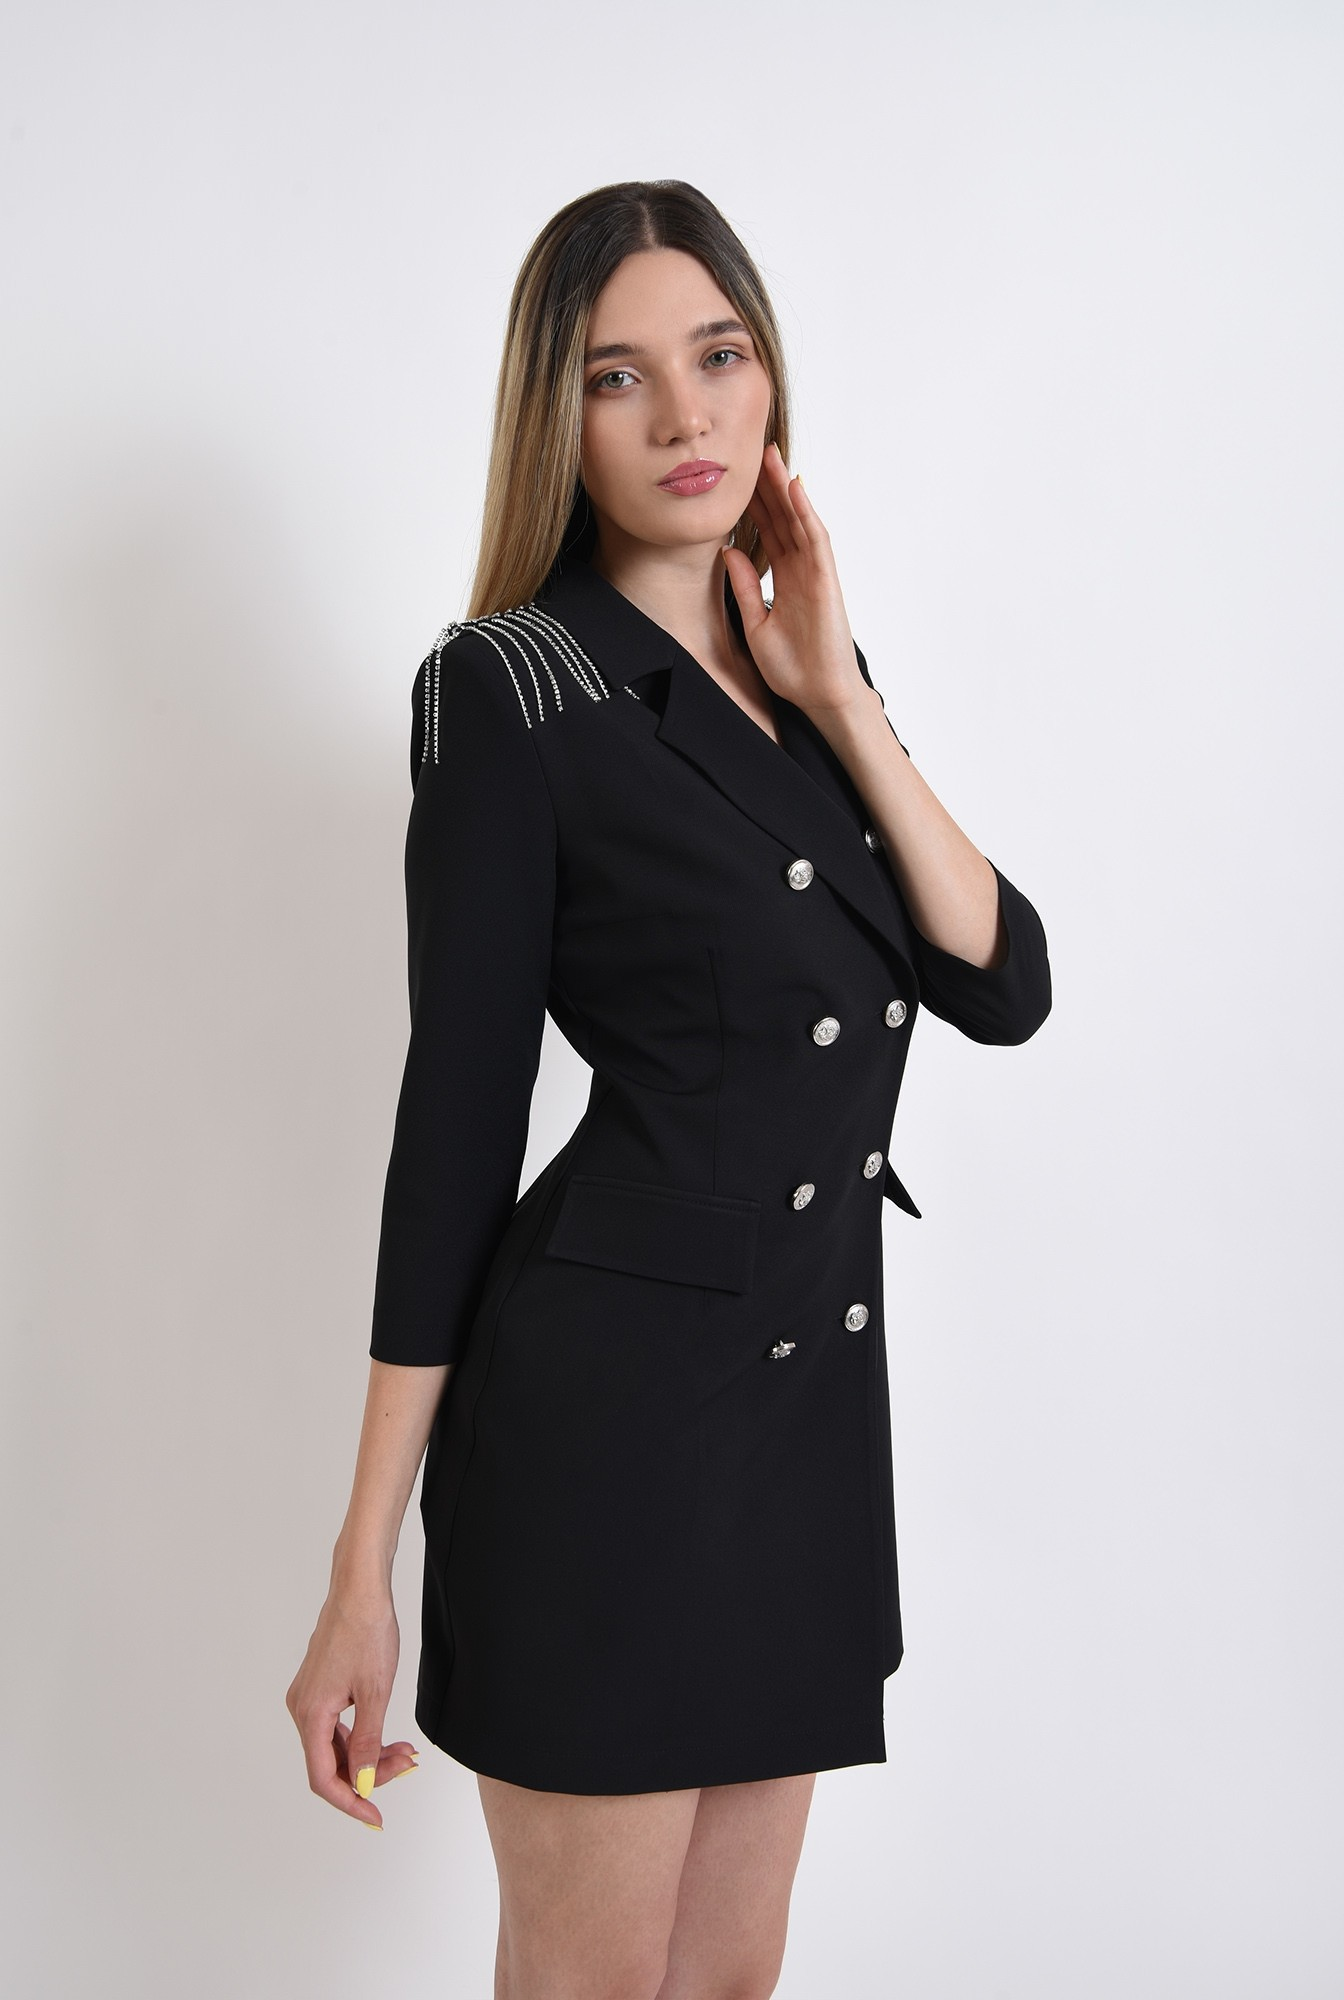 1 - rochie neagra, stil sacou, cu nasturi metalici